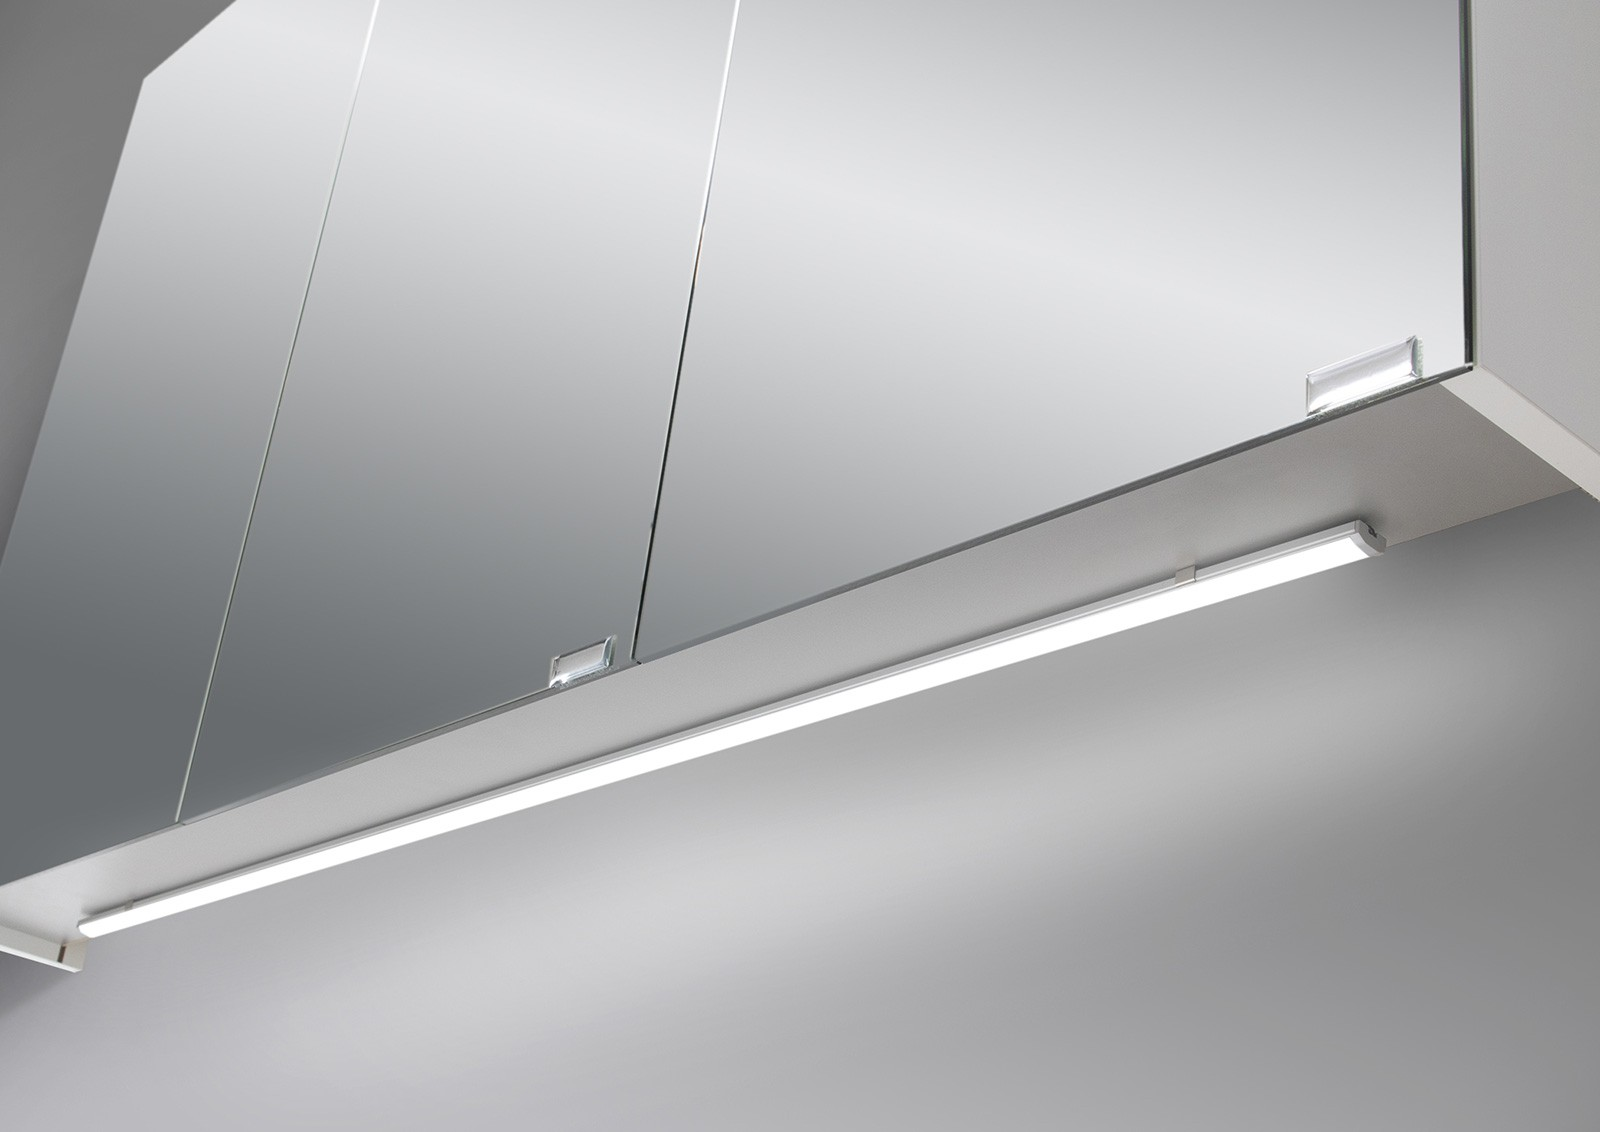 spiegelschrank bad 120 cm led beleuchtung mit farbwechsel doppelseitig verspiegelt 5207. Black Bedroom Furniture Sets. Home Design Ideas